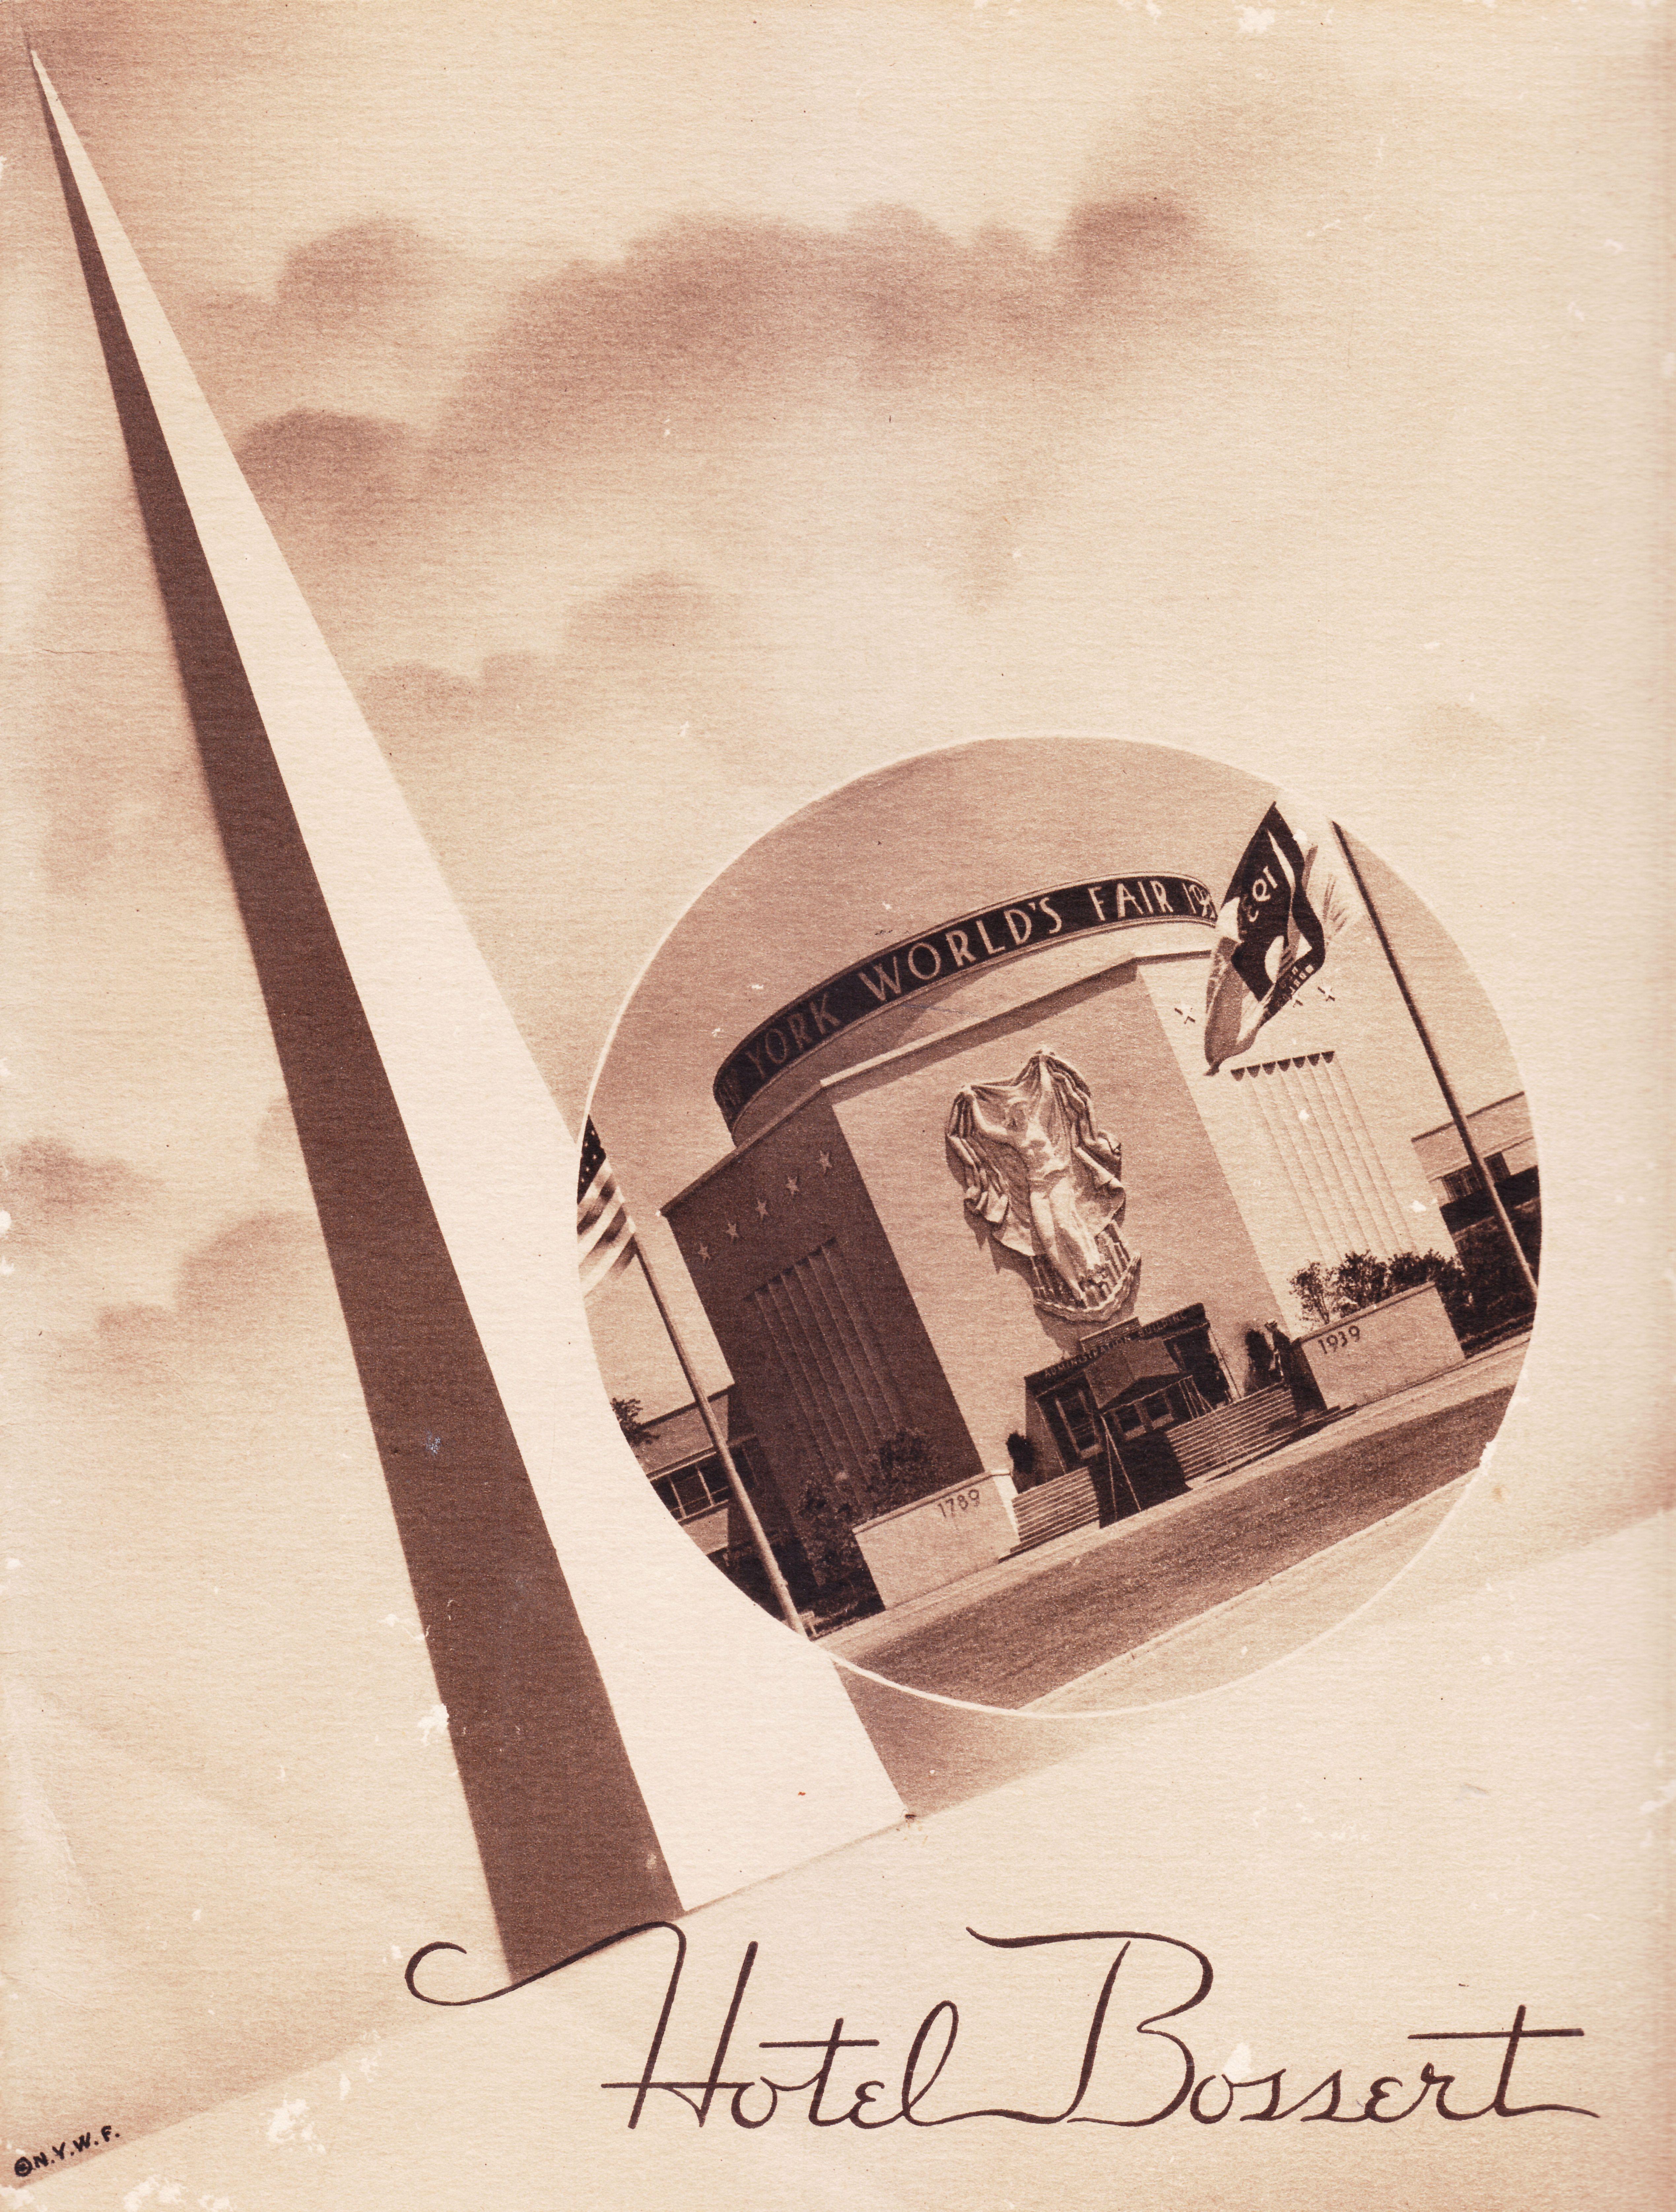 1939 New York World's Fair Menu